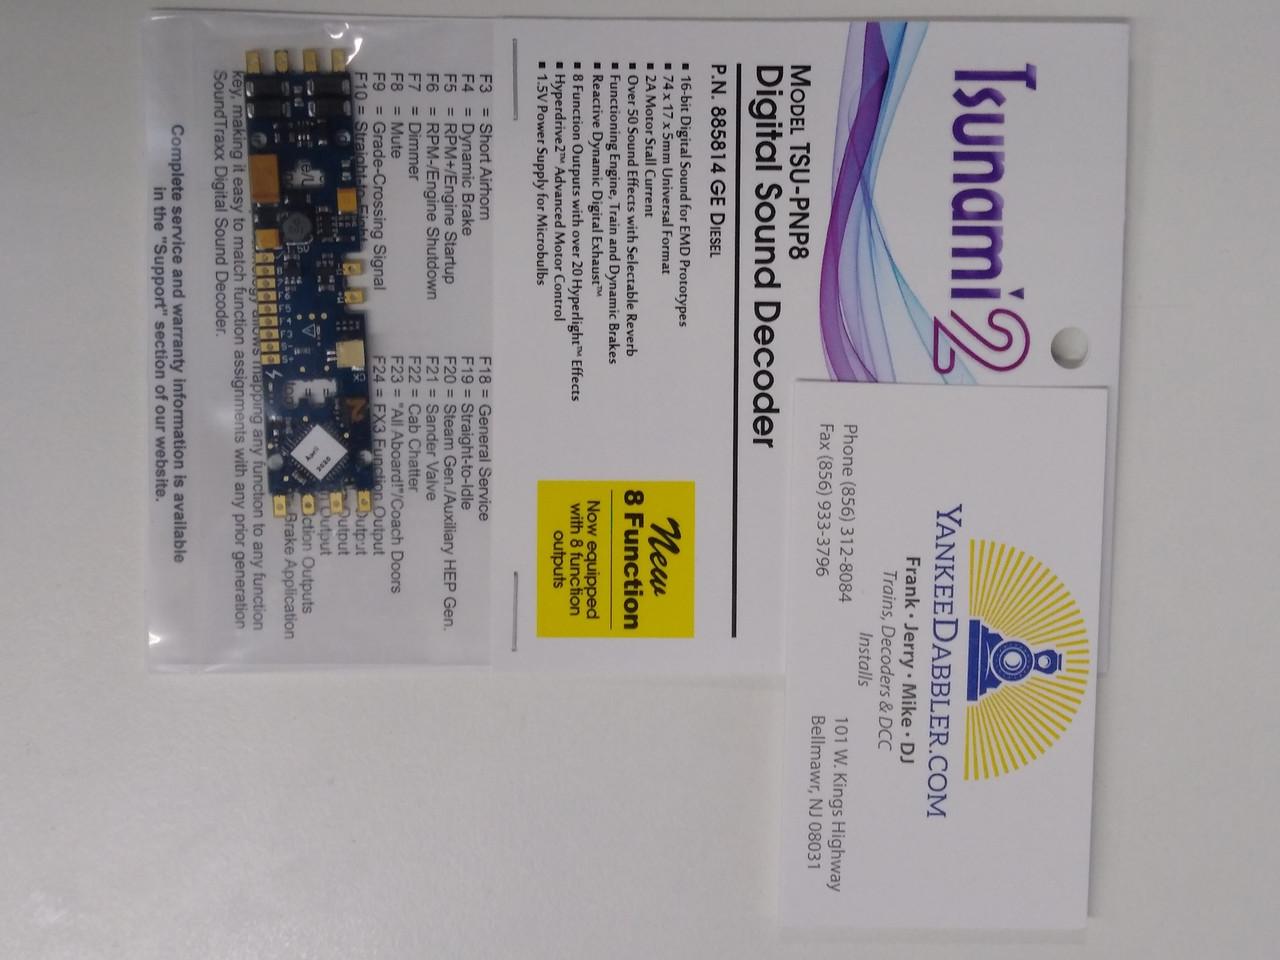 Sountraxx 885814 Tsunami 2 Diesel GE Set, 8-Function, Plug and Play TSU-PNP (2 Amp) Digital Sound Decoders   (Scale=HO) Part # = 678-885814